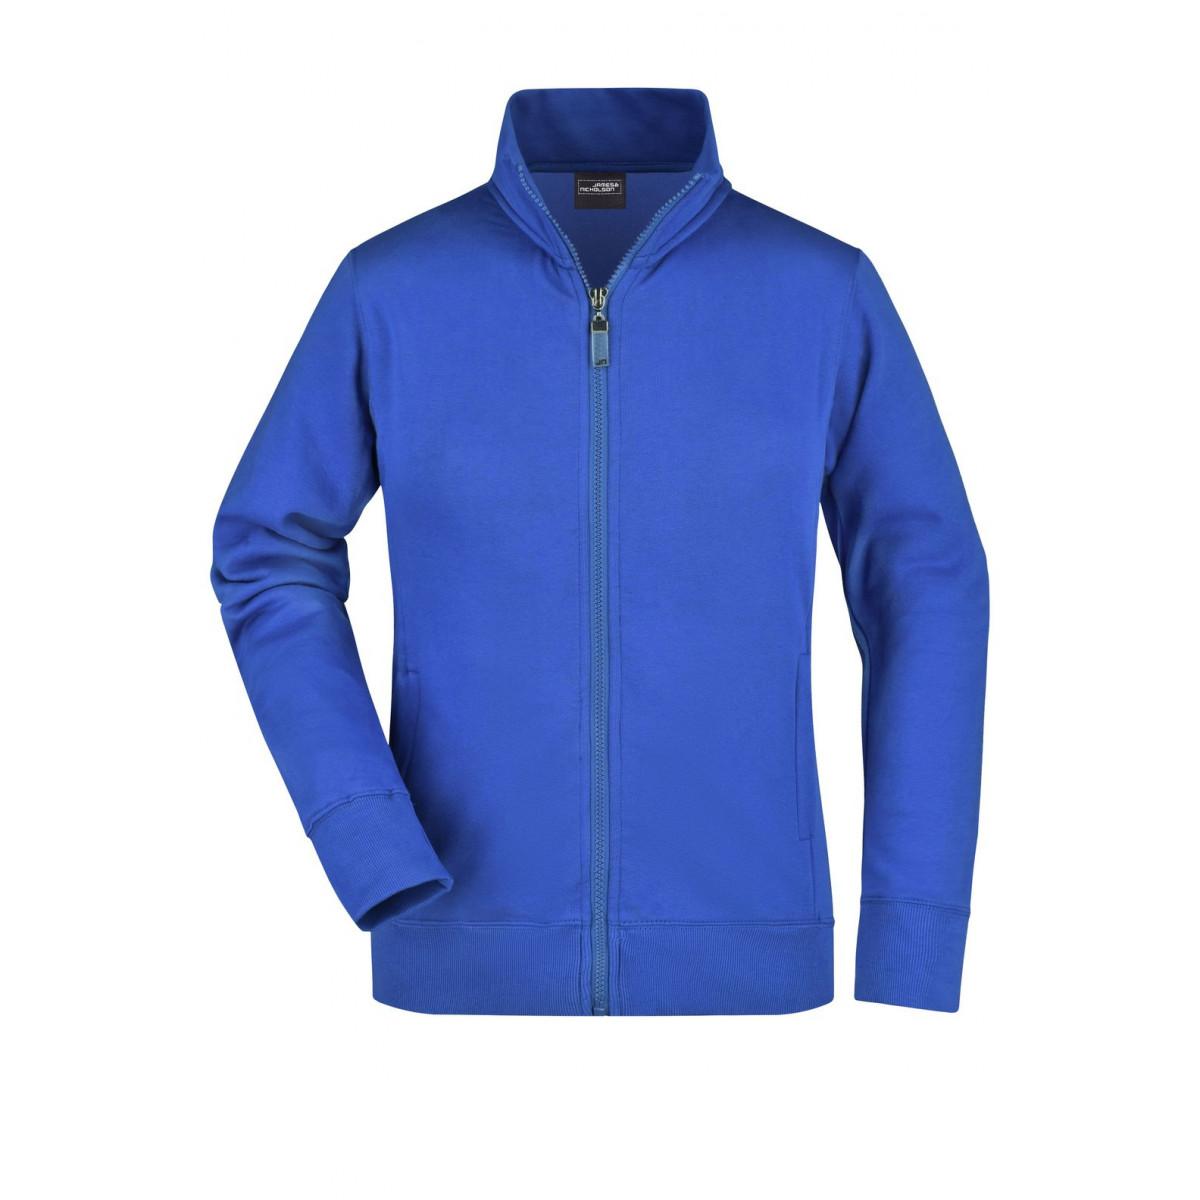 Толстовка женская JN052 Ladies Jacket - Ярко-синий